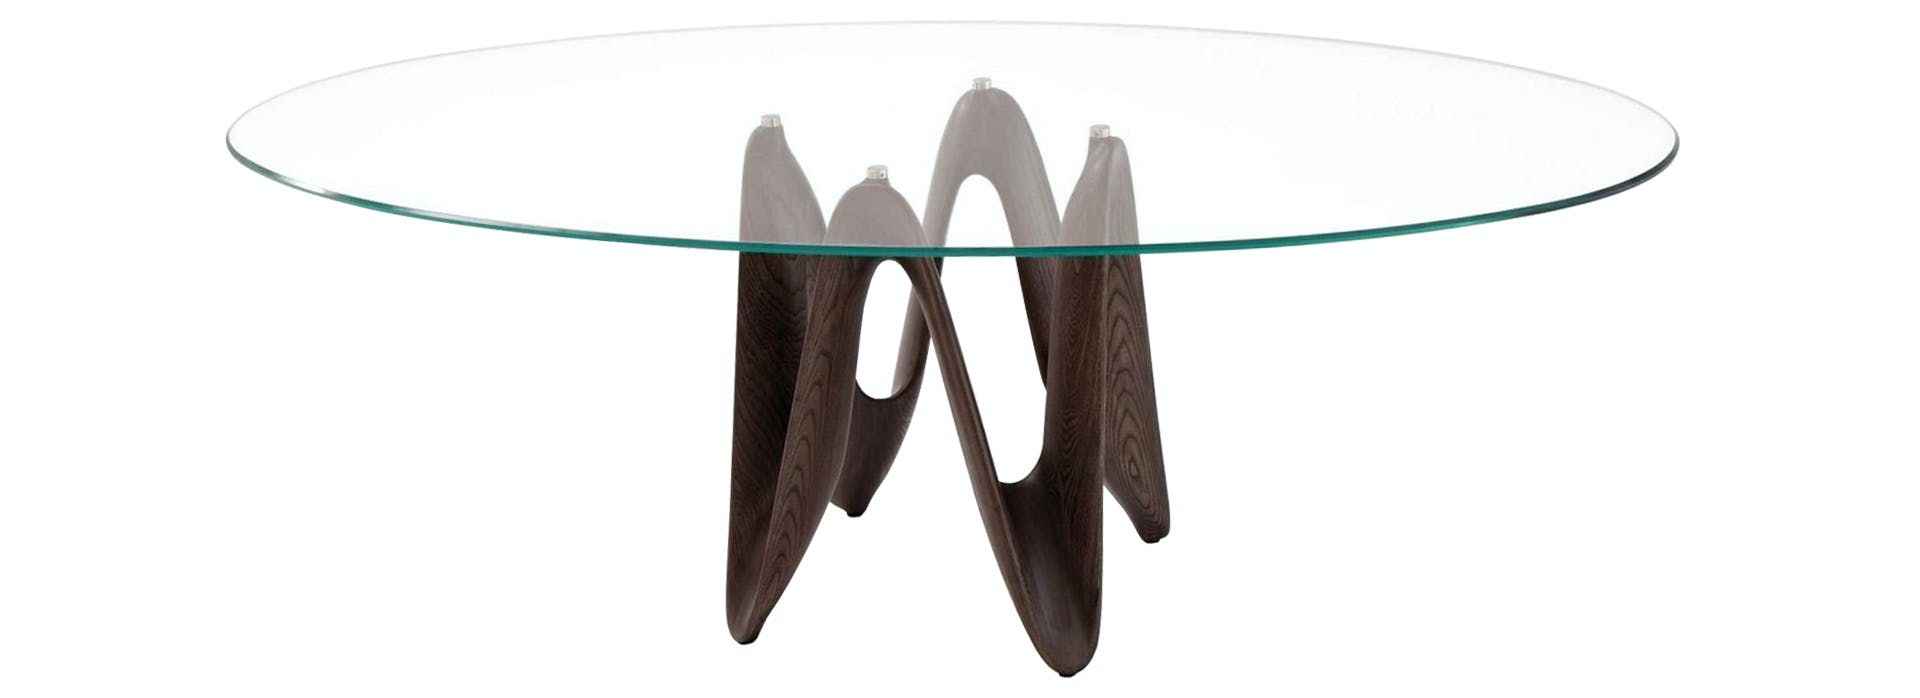 Sovet-clear-lambda-table-haute-living